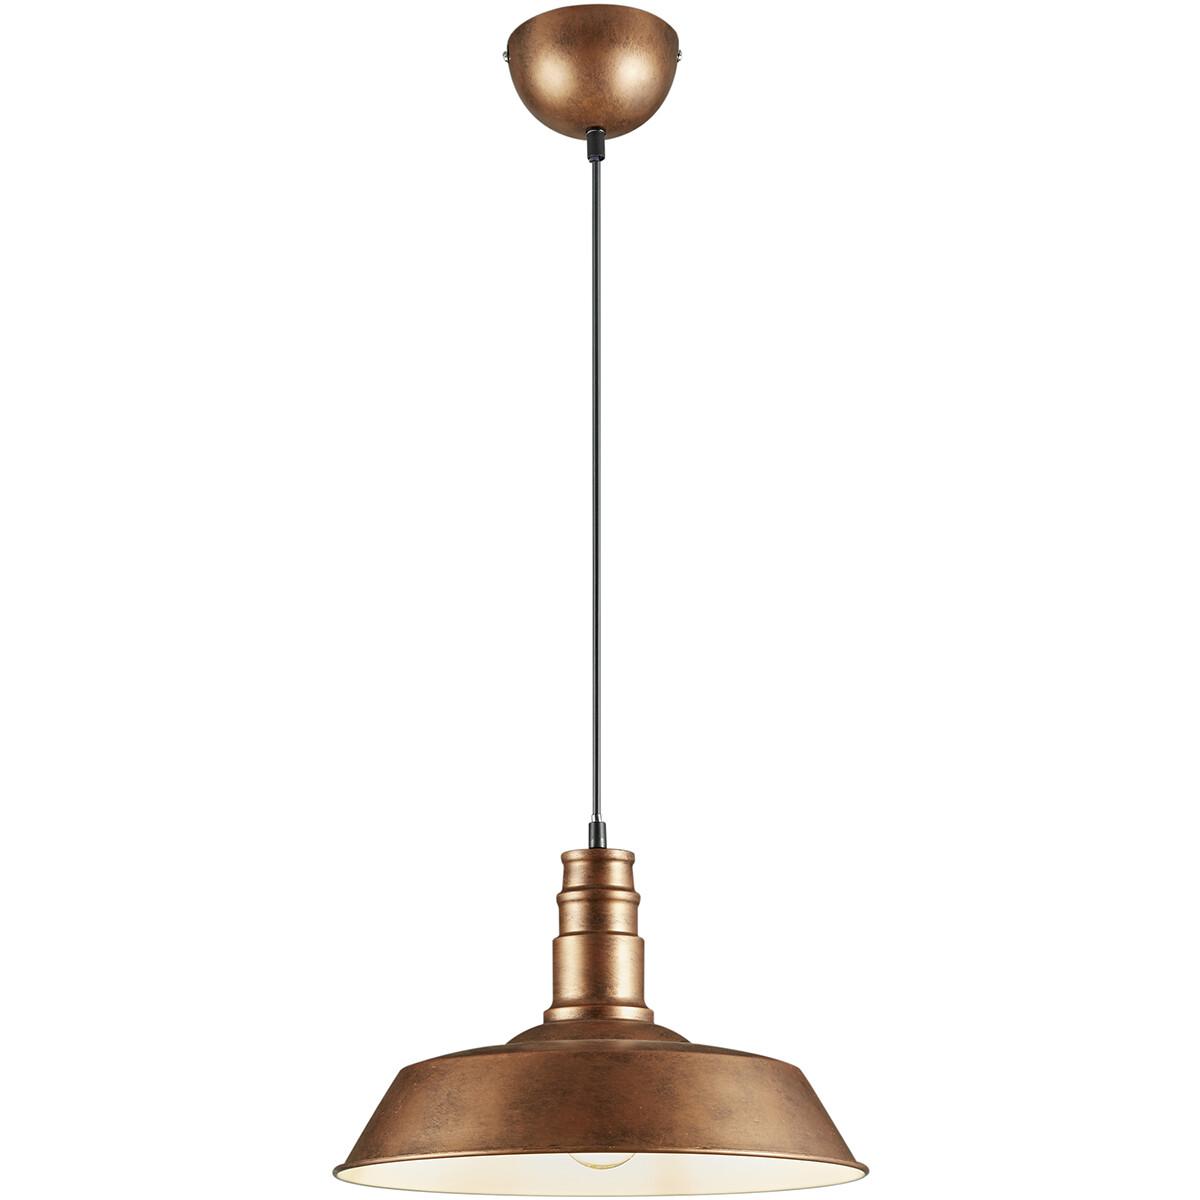 LED Hanglamp - Hangverlichting - Trion Wulo - E27 Fitting - Rond - Antiek Koper - Aluminium